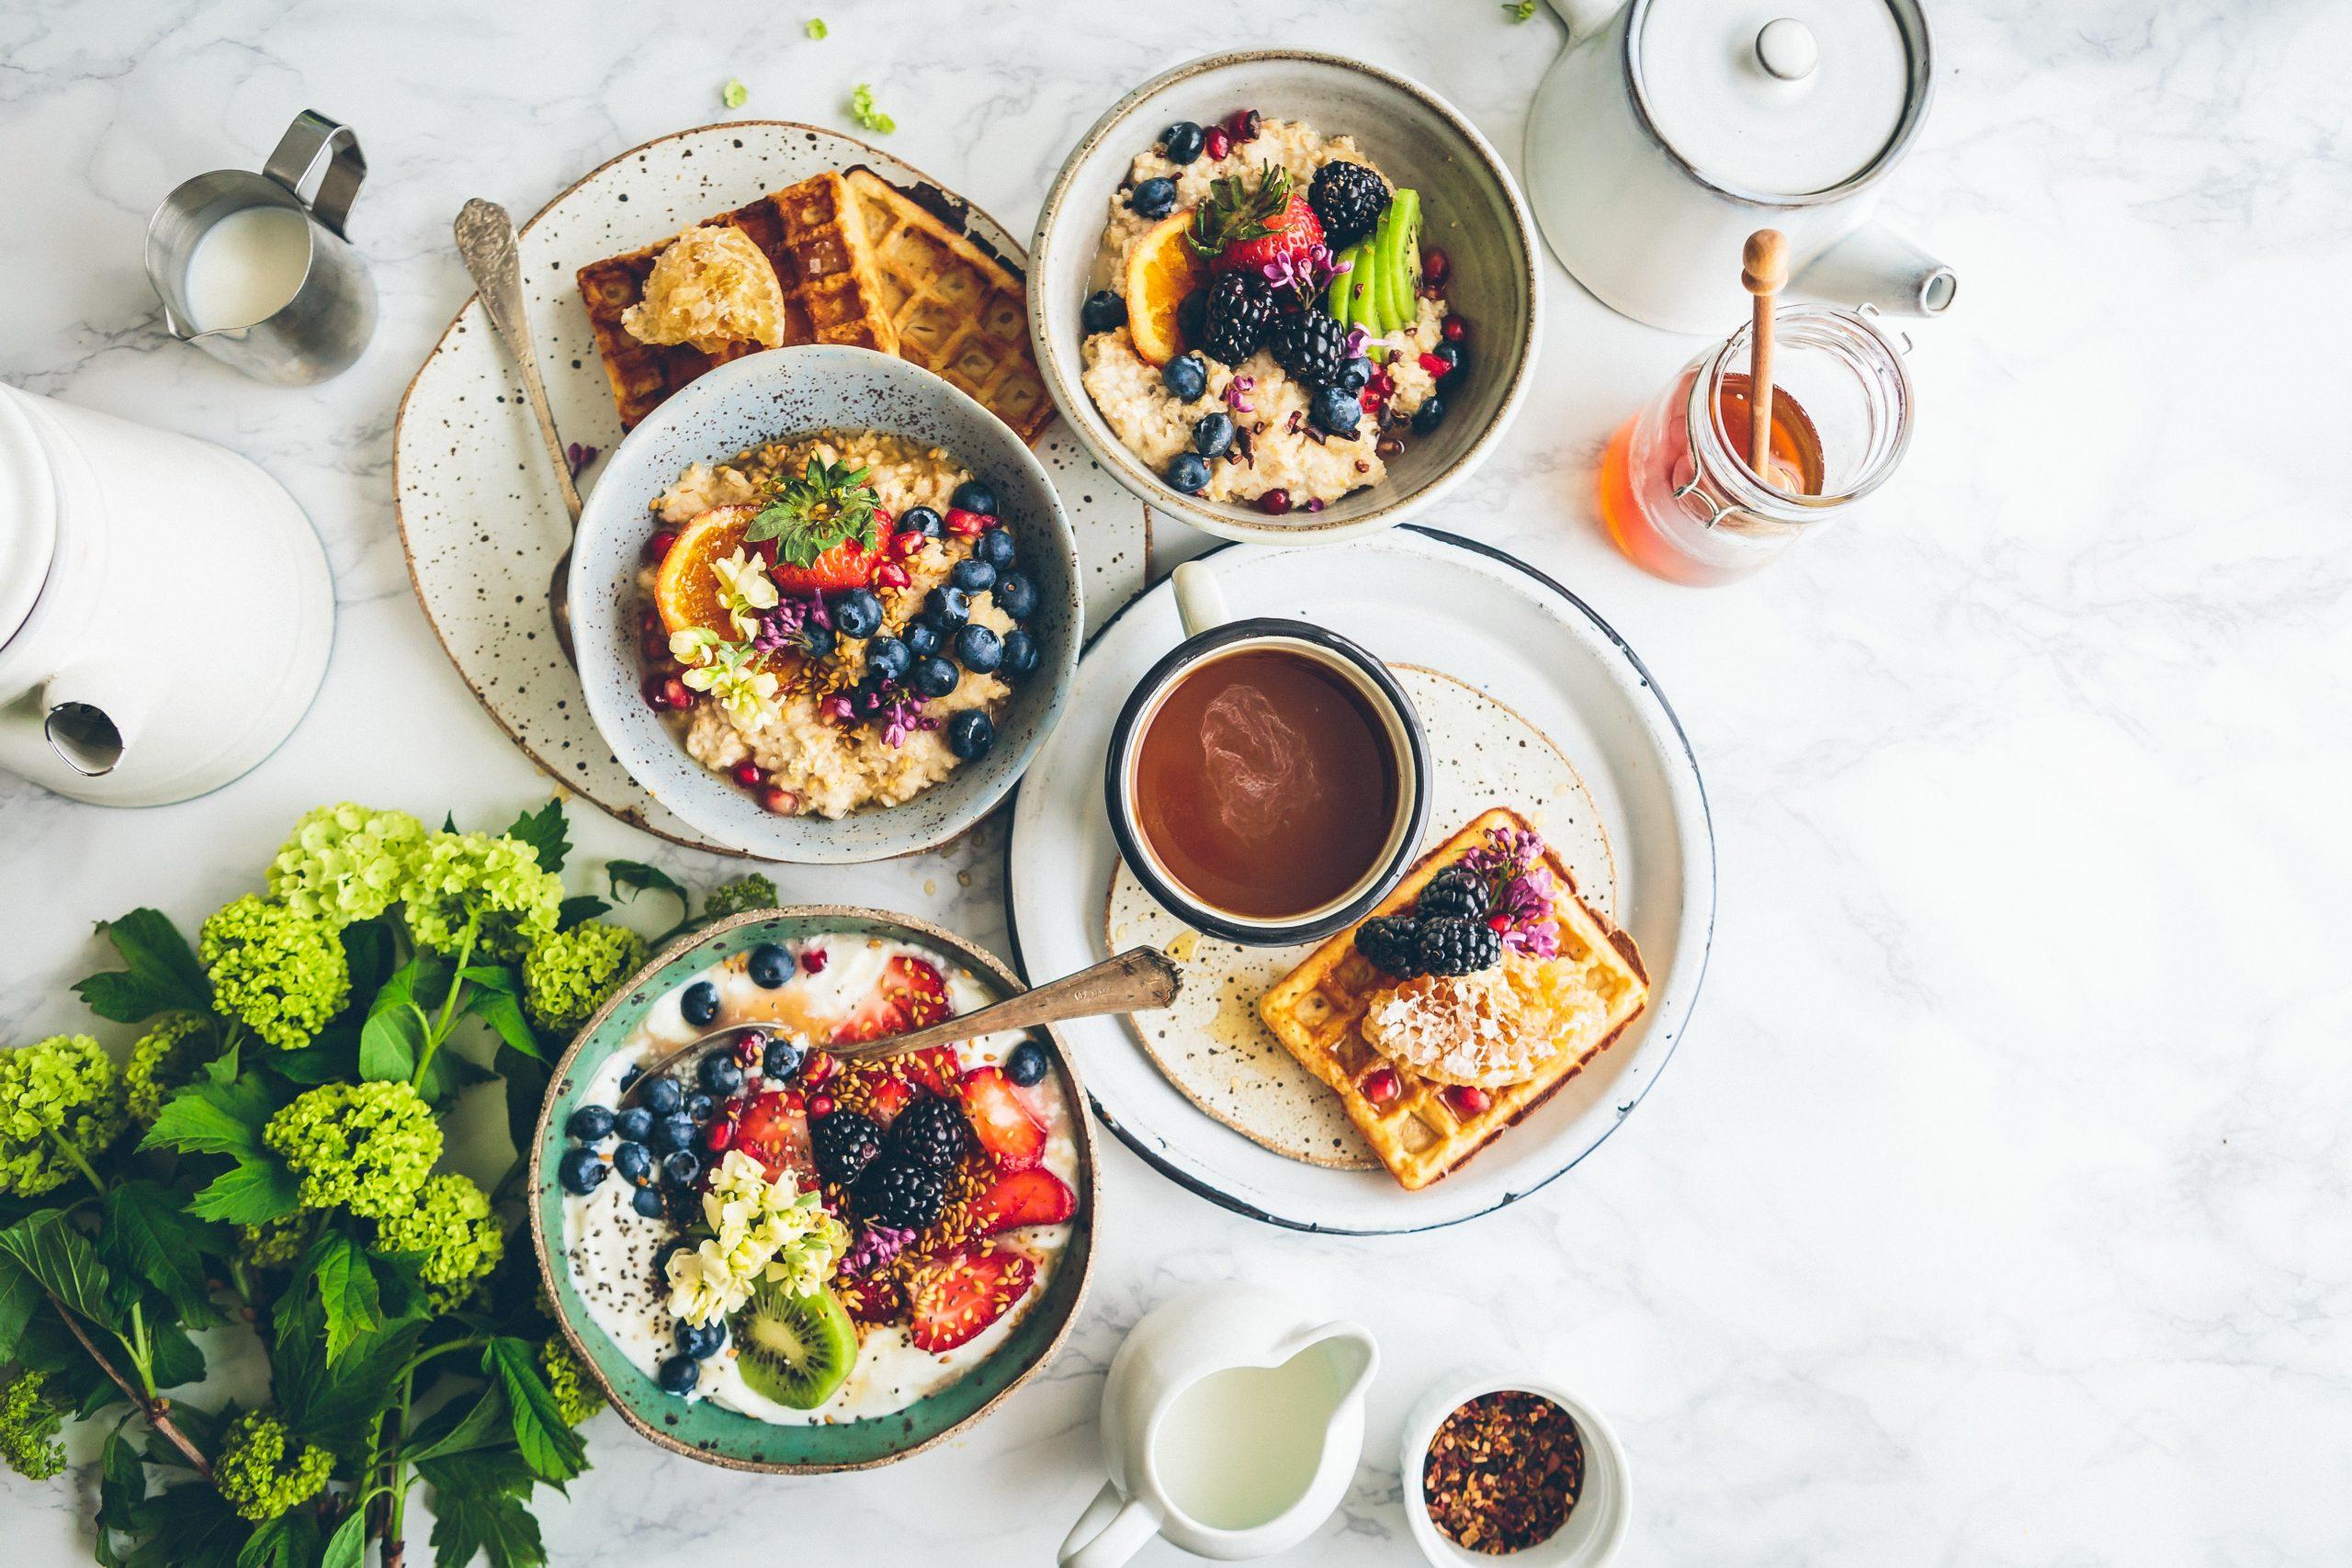 wallpaper Fruit salad on gray bowls